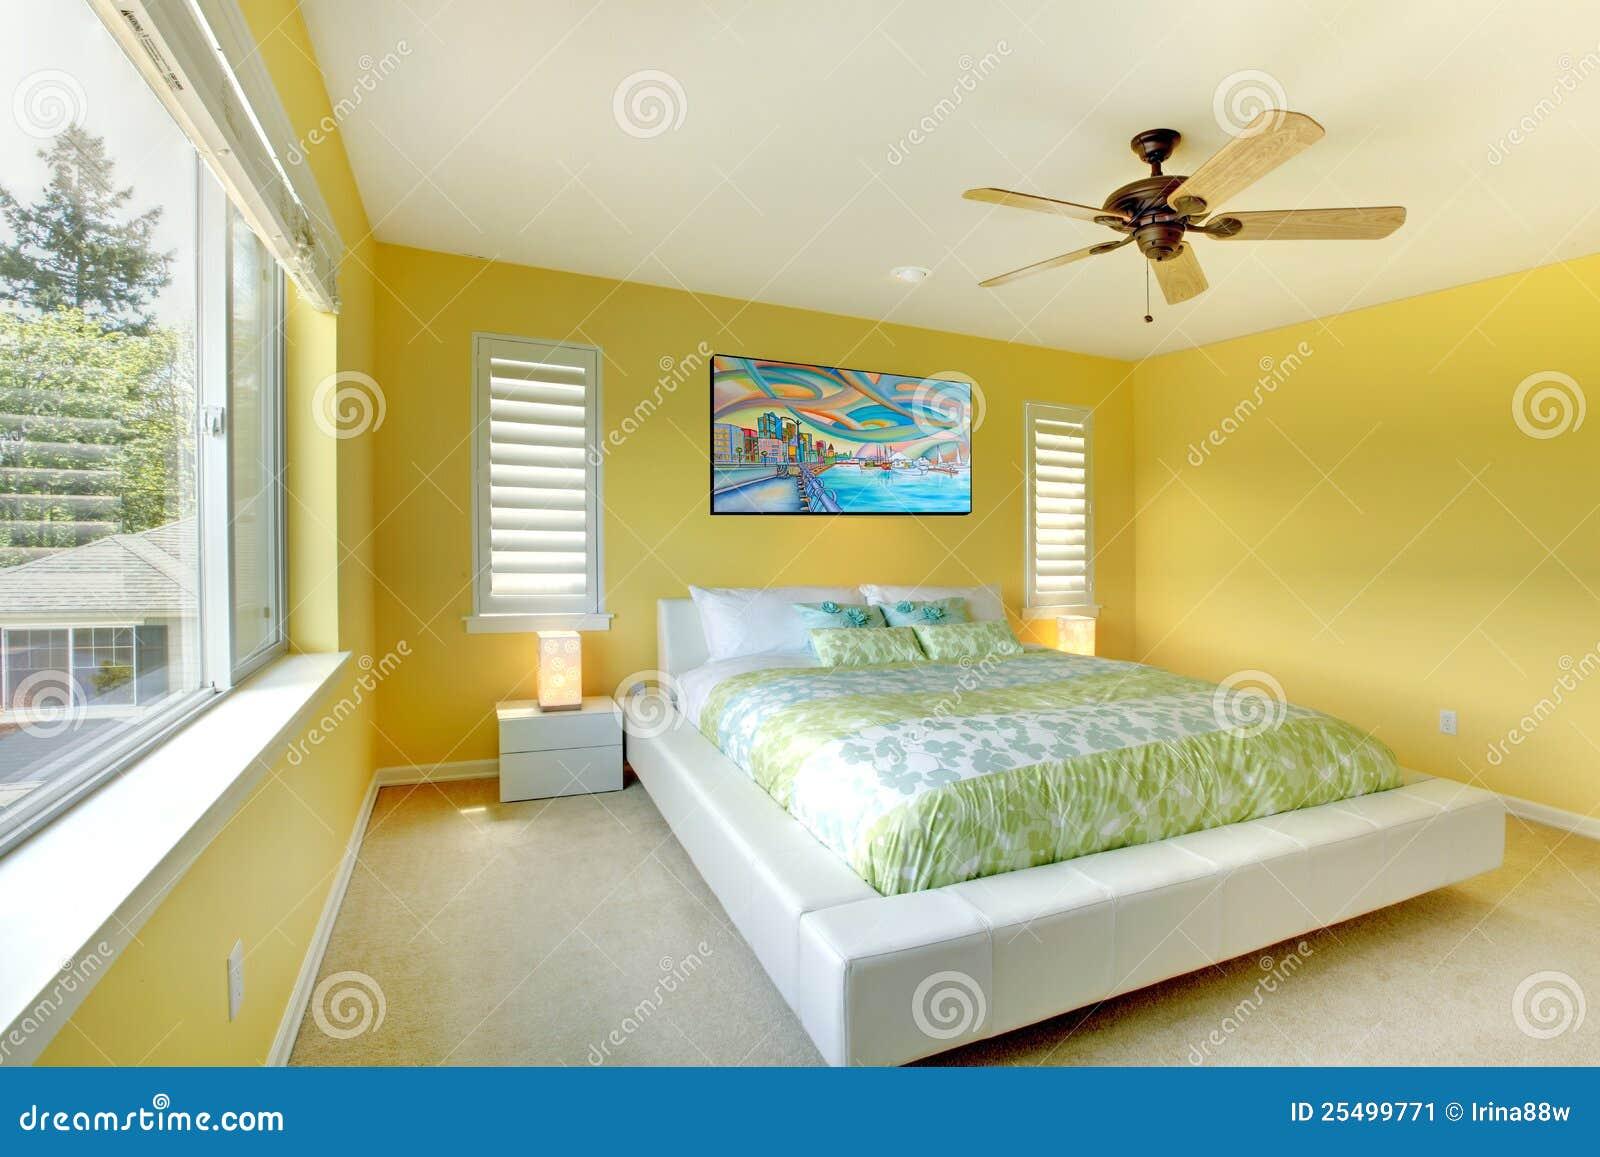 Slaapkamer Bruin Bed : Gele Moderne Slaapkamer Met Wit Bed. Stock ...